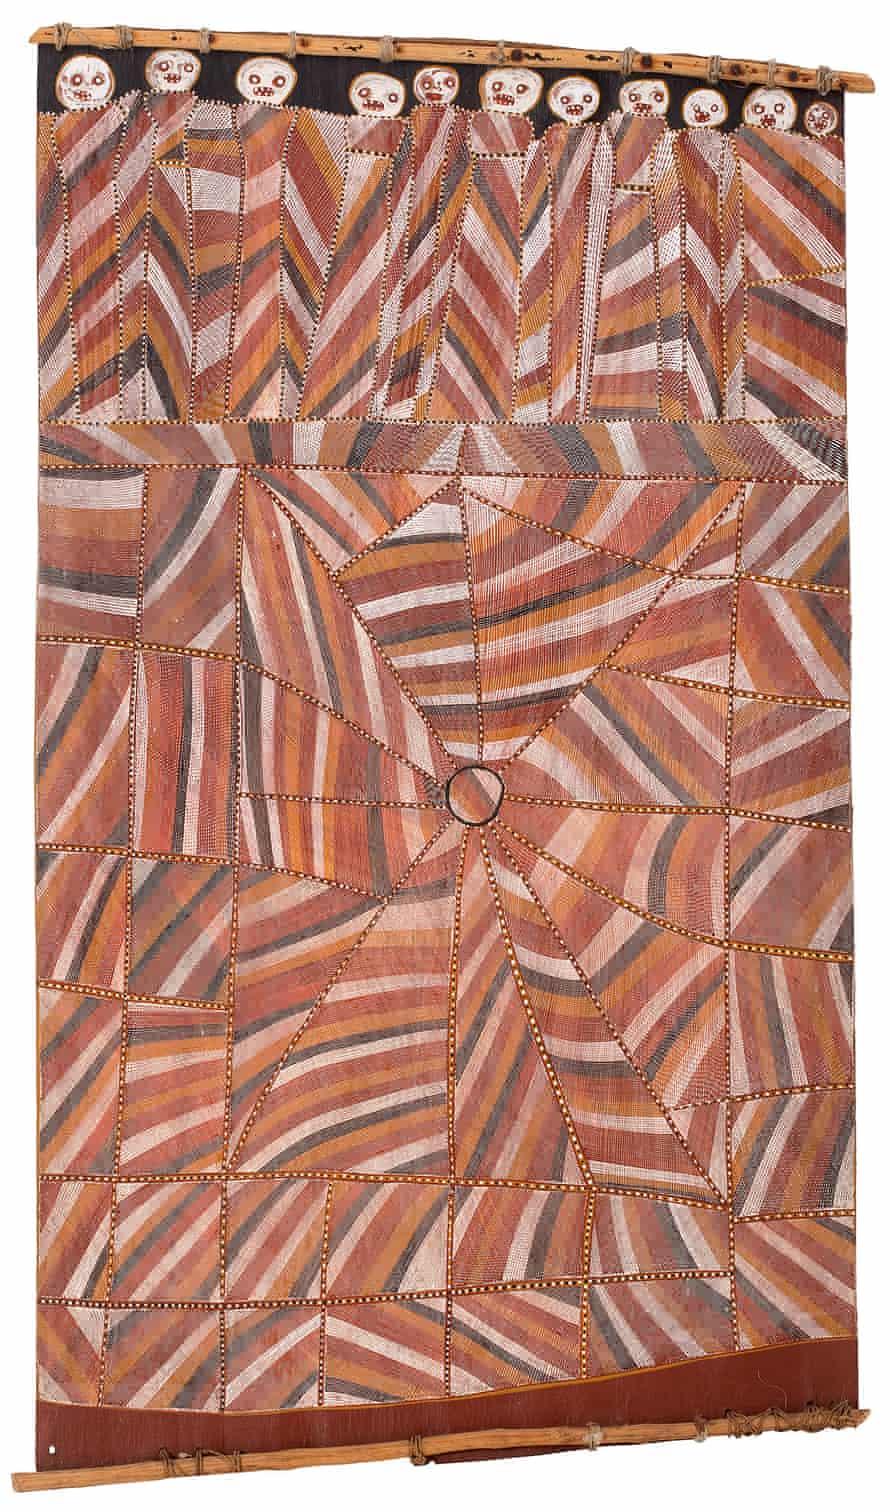 Buluwana, female ancestor, at Dilebang. 1993. Earth pigments on Stringybark (Eucalyptus tetrodonta)